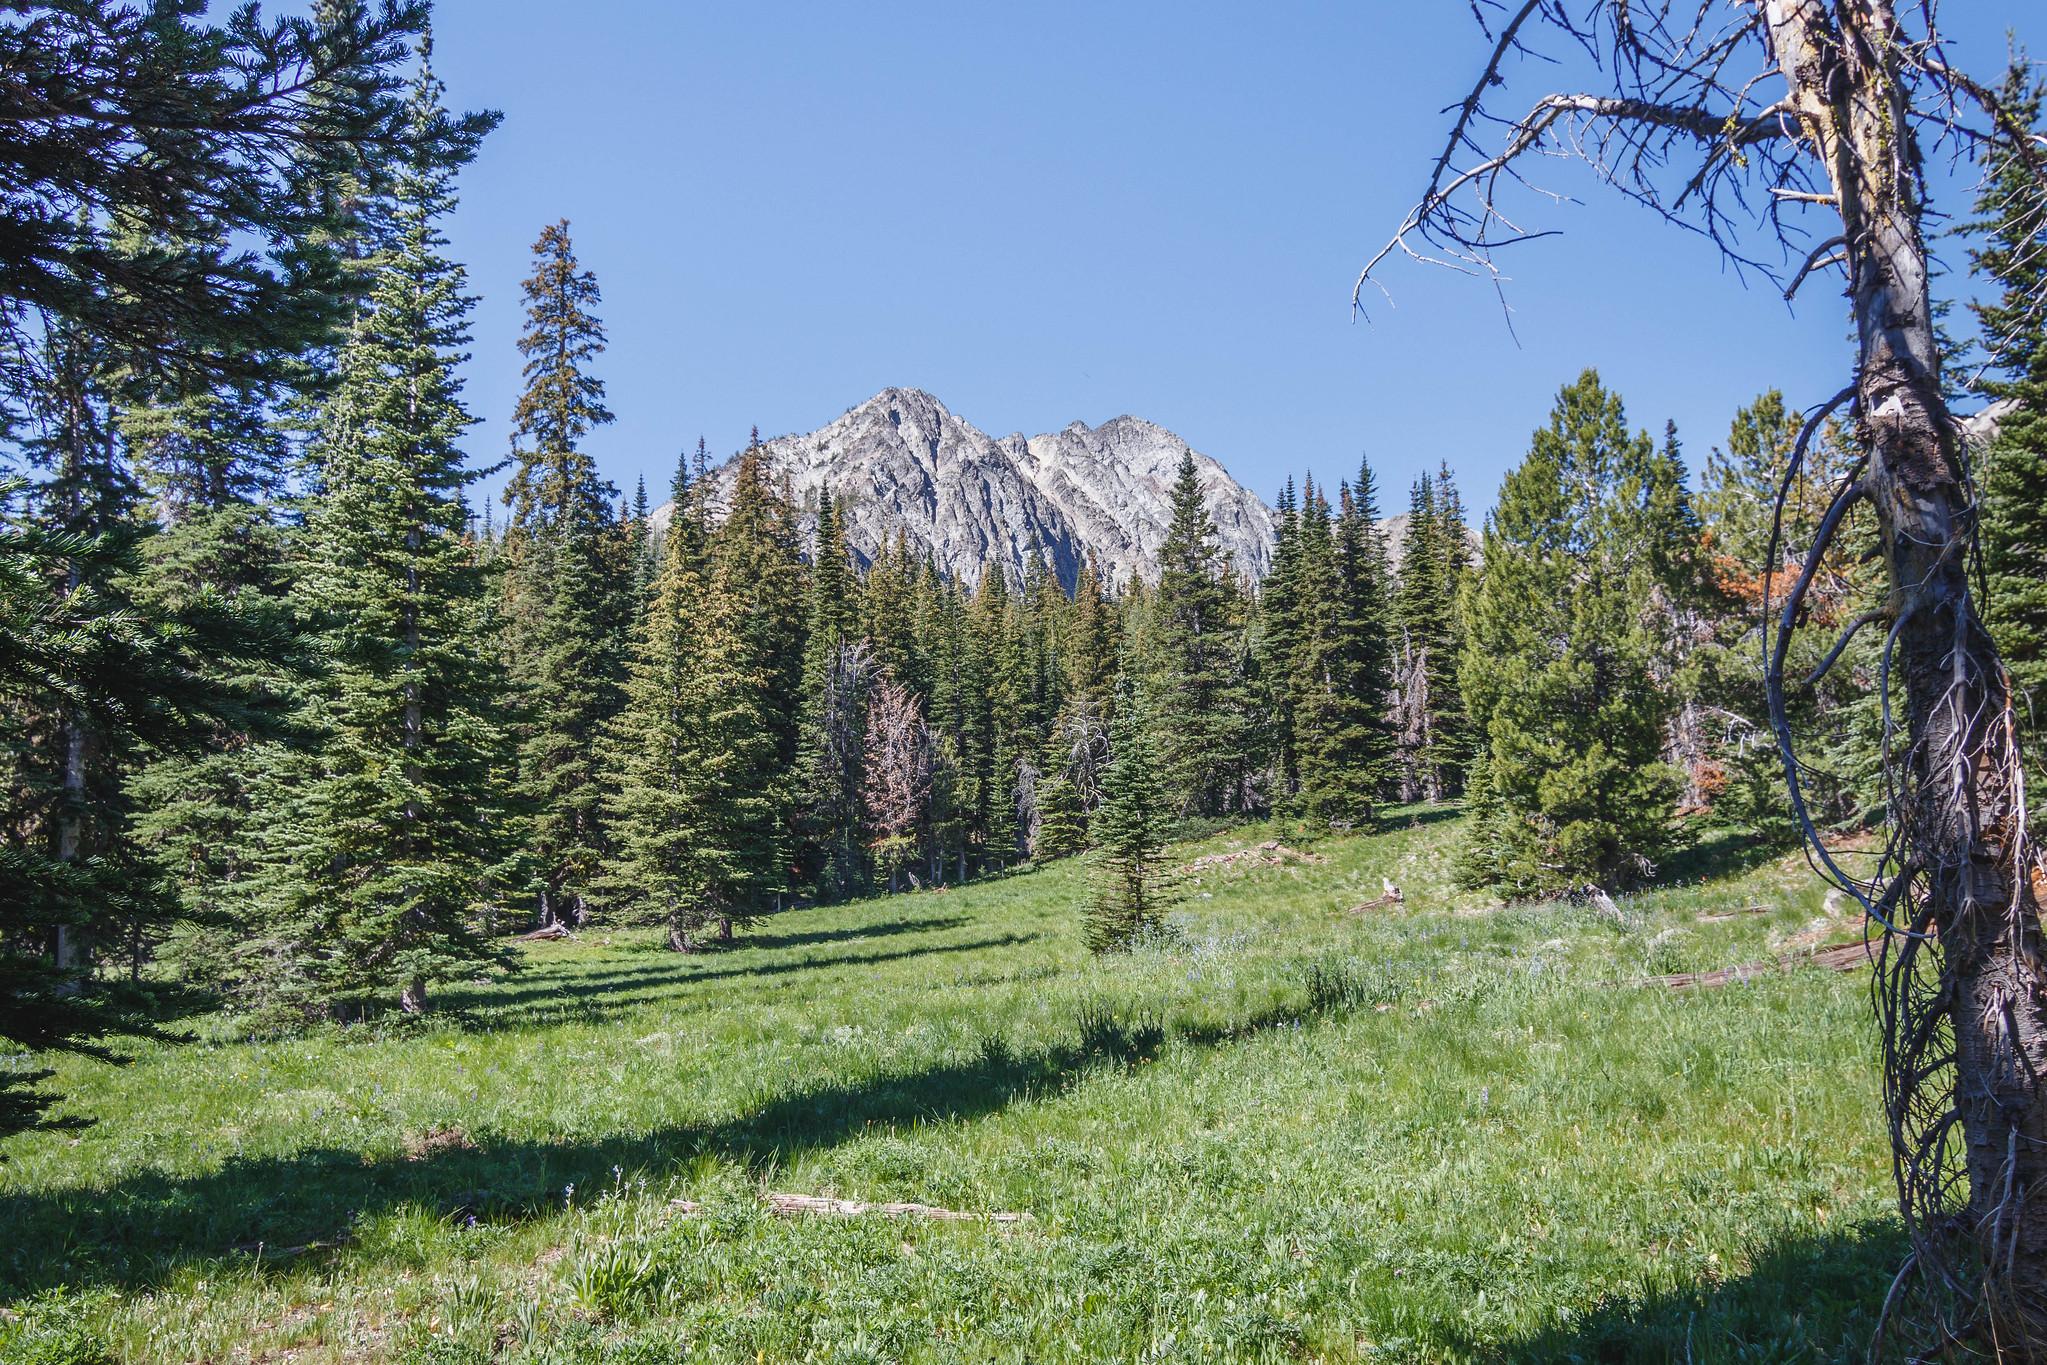 Bullhorn Peak